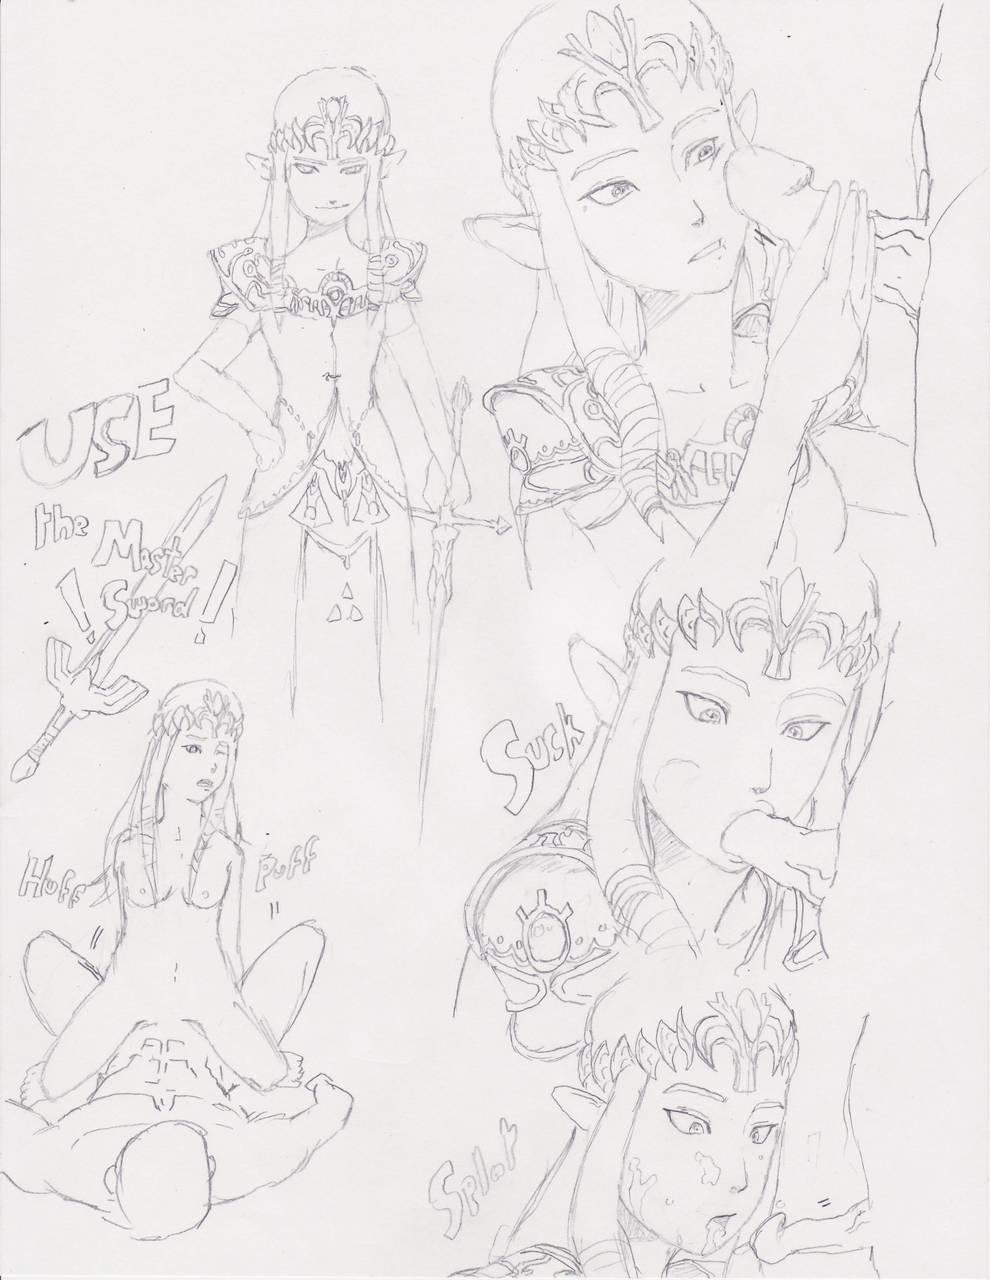 zelda princess twilight ilia legend of Rick and morty beth naked